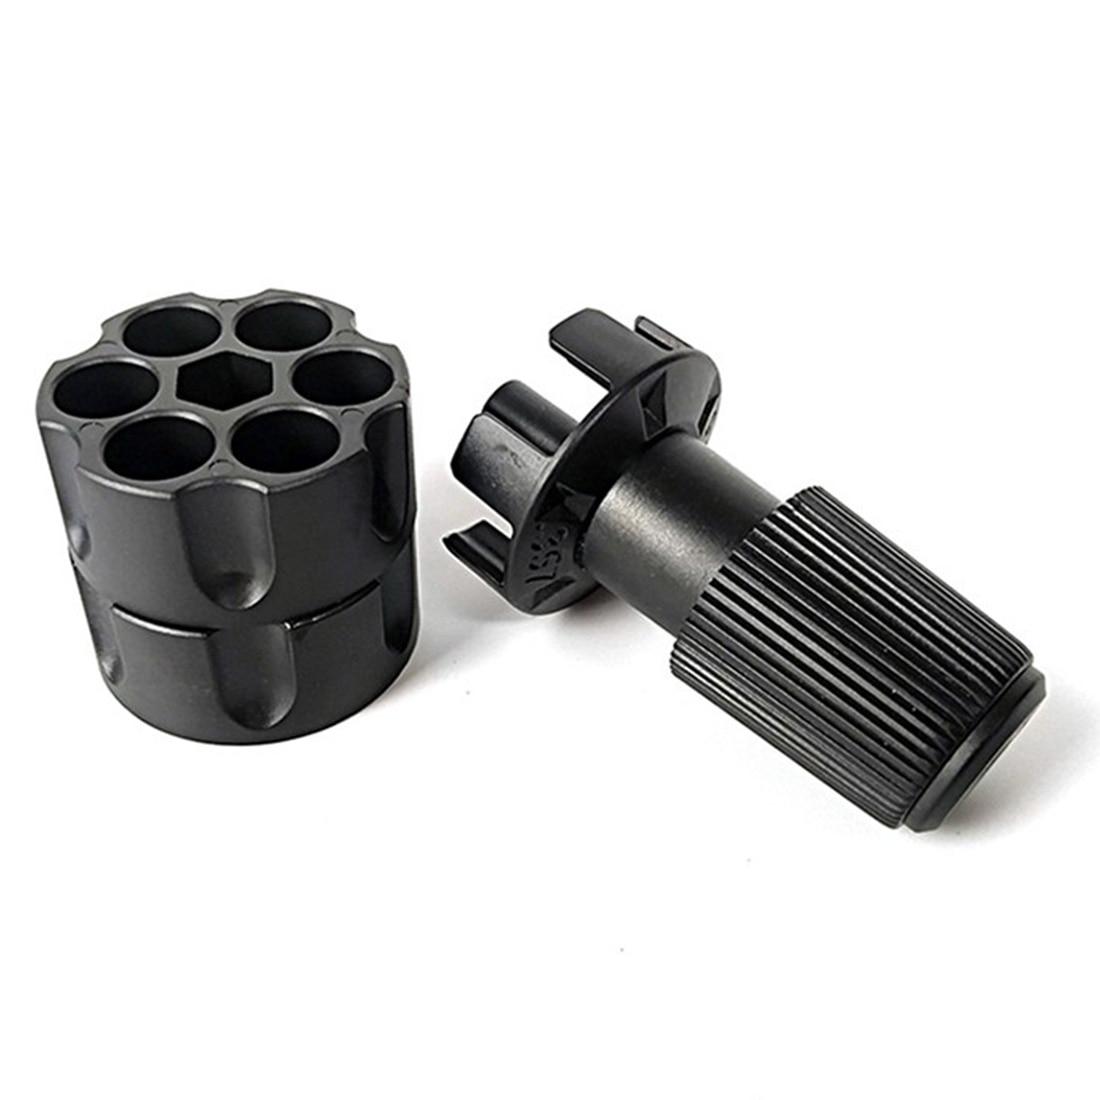 Speedloader For Little Moon ZP5 Water Gel Beads Blaster - Black